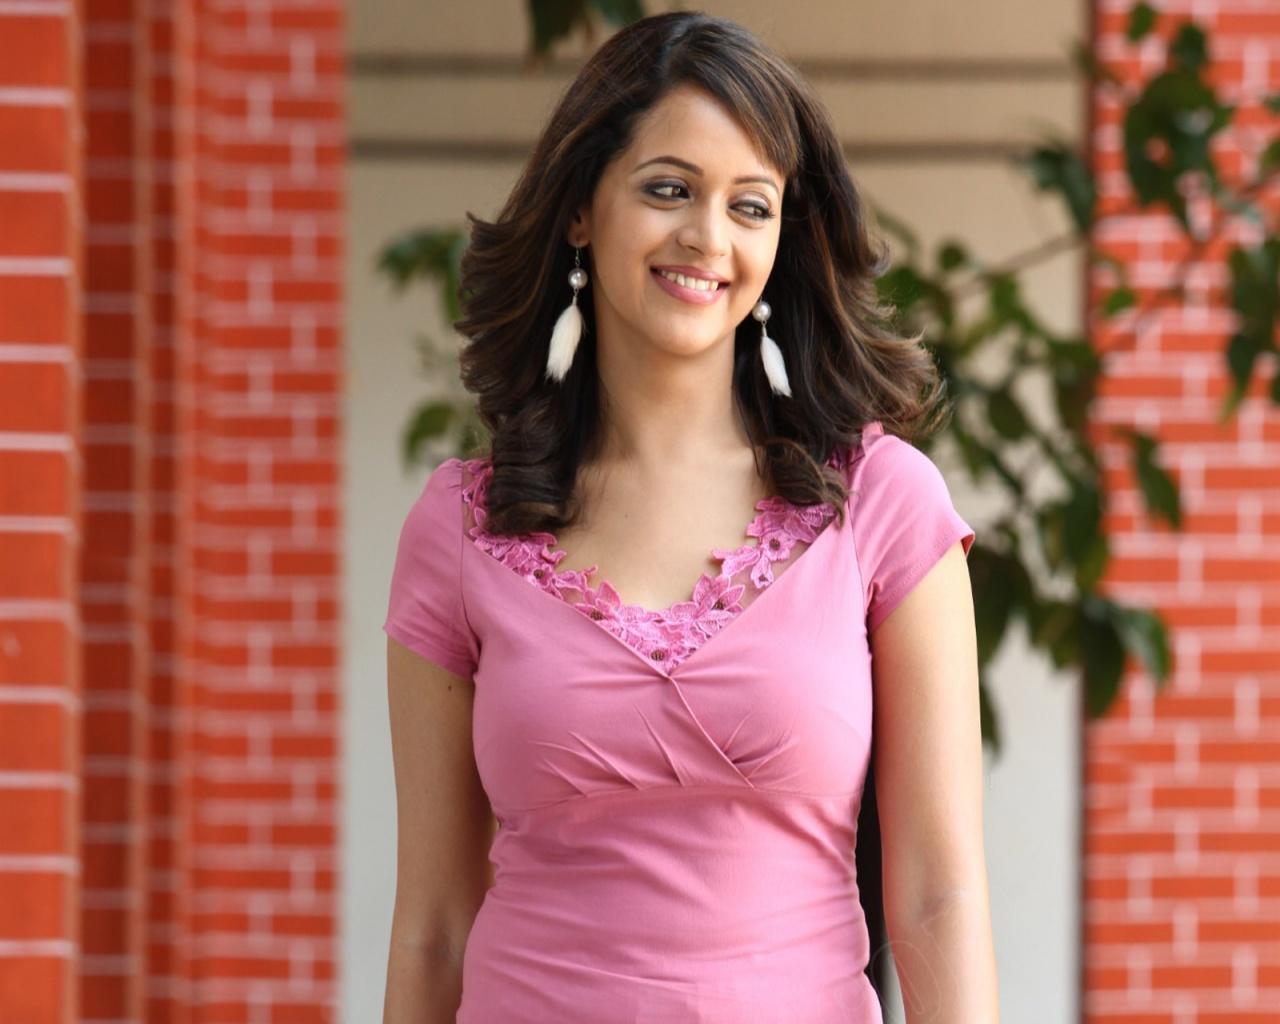 Tamil actress hd wallpapers 2013 wallpapersafari New all hd video